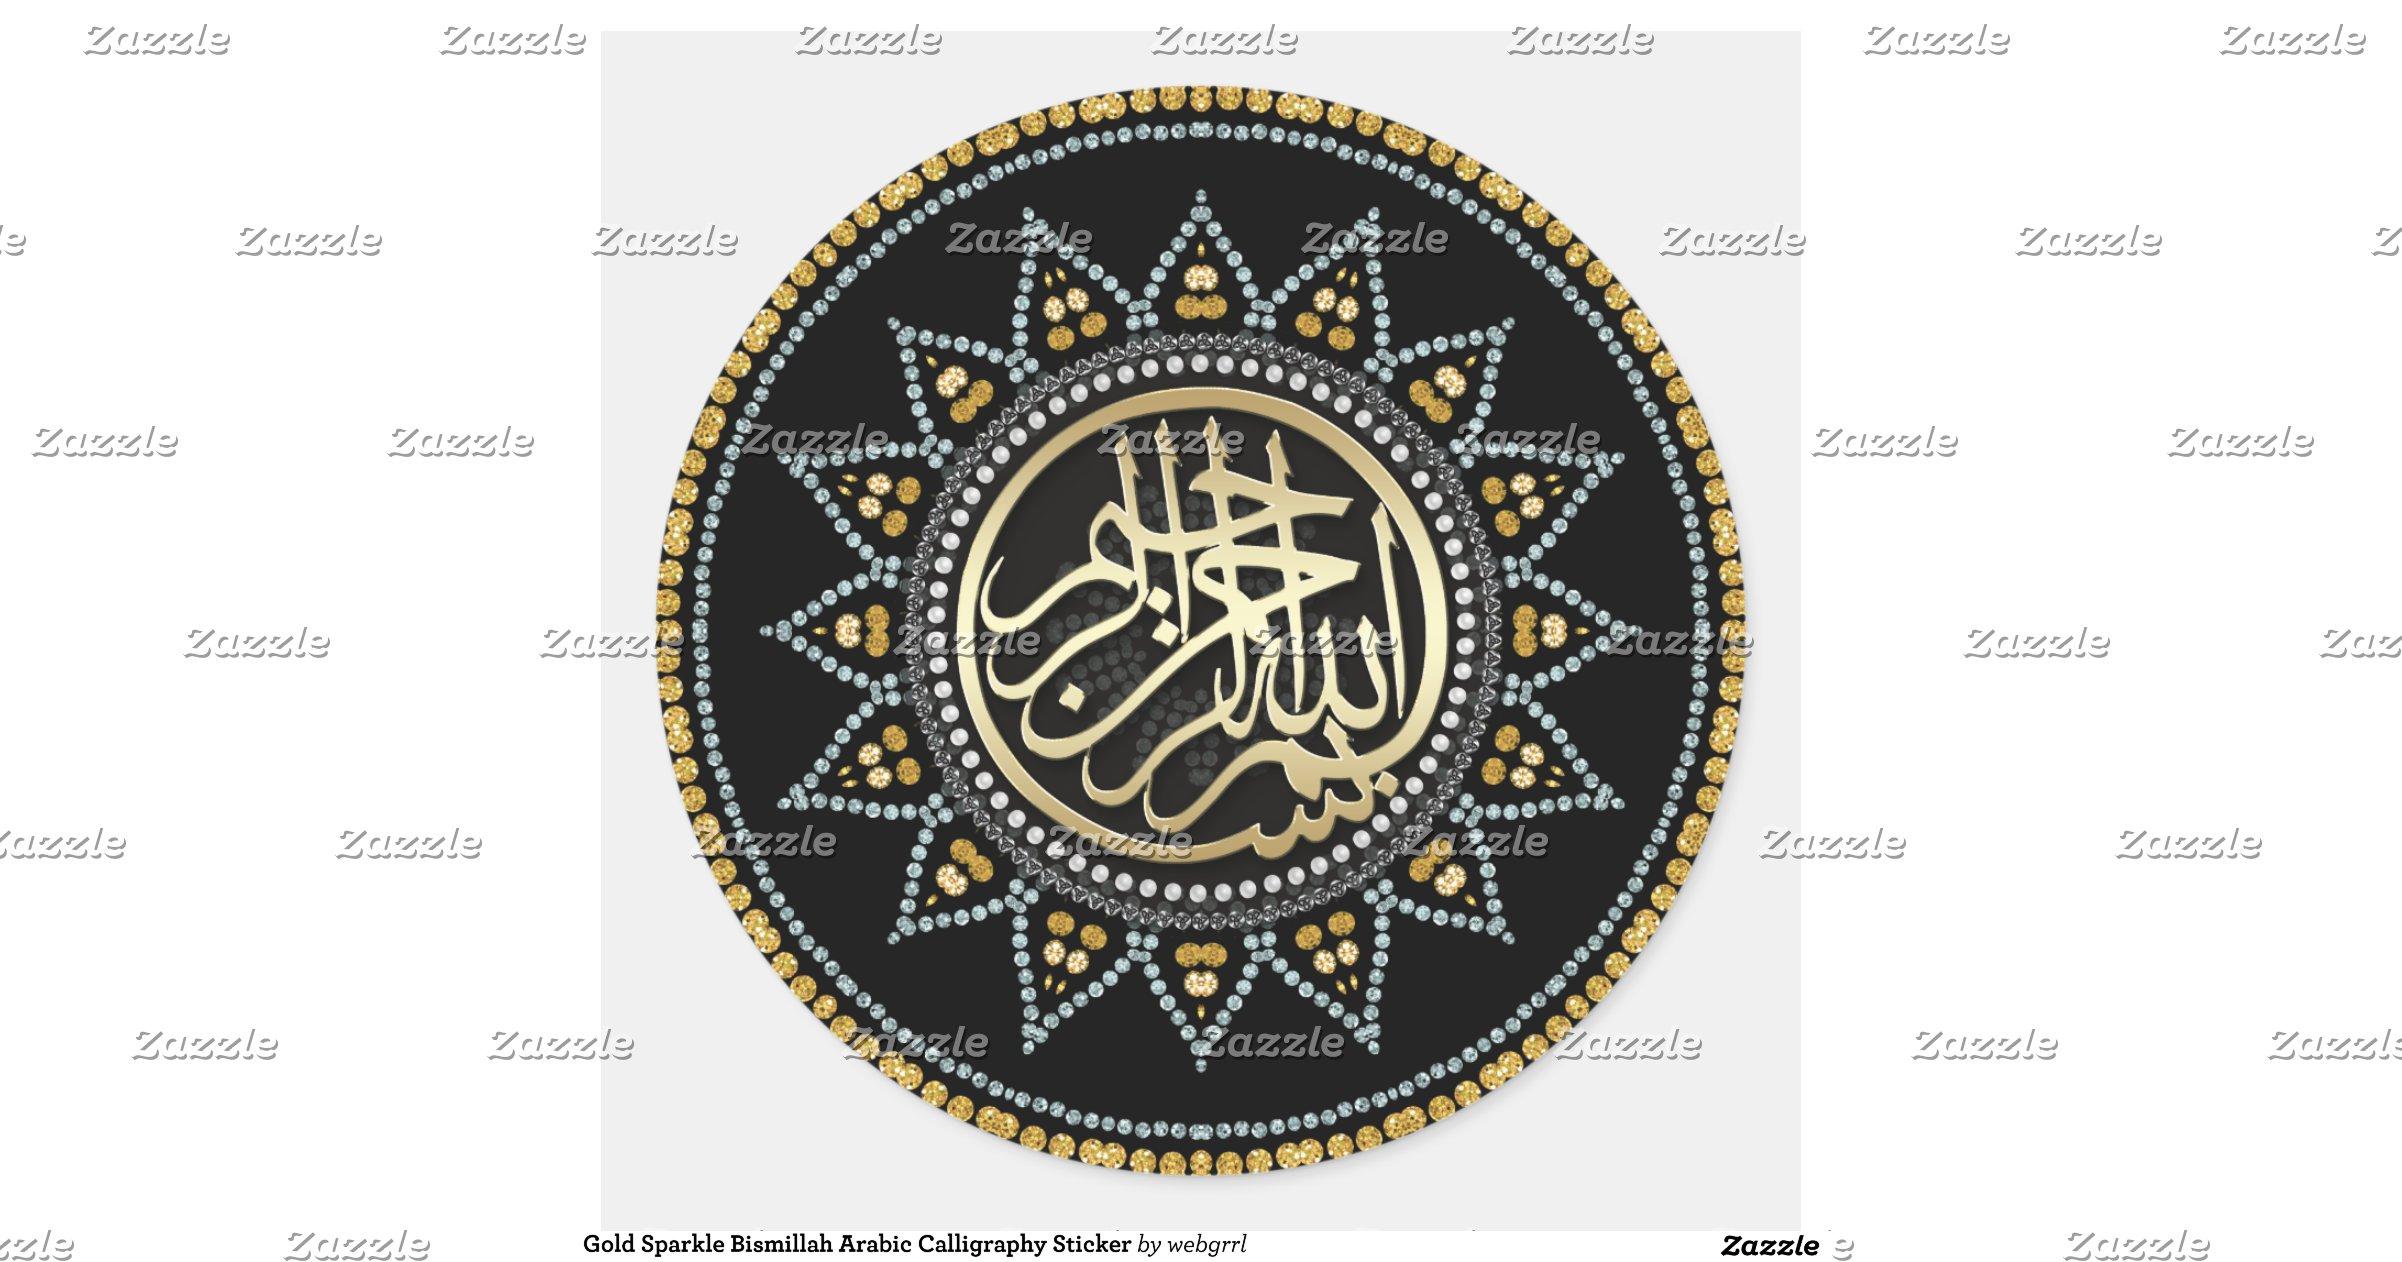 gold sparkle bismillah arabic calligraphy sticker zazzle. Black Bedroom Furniture Sets. Home Design Ideas